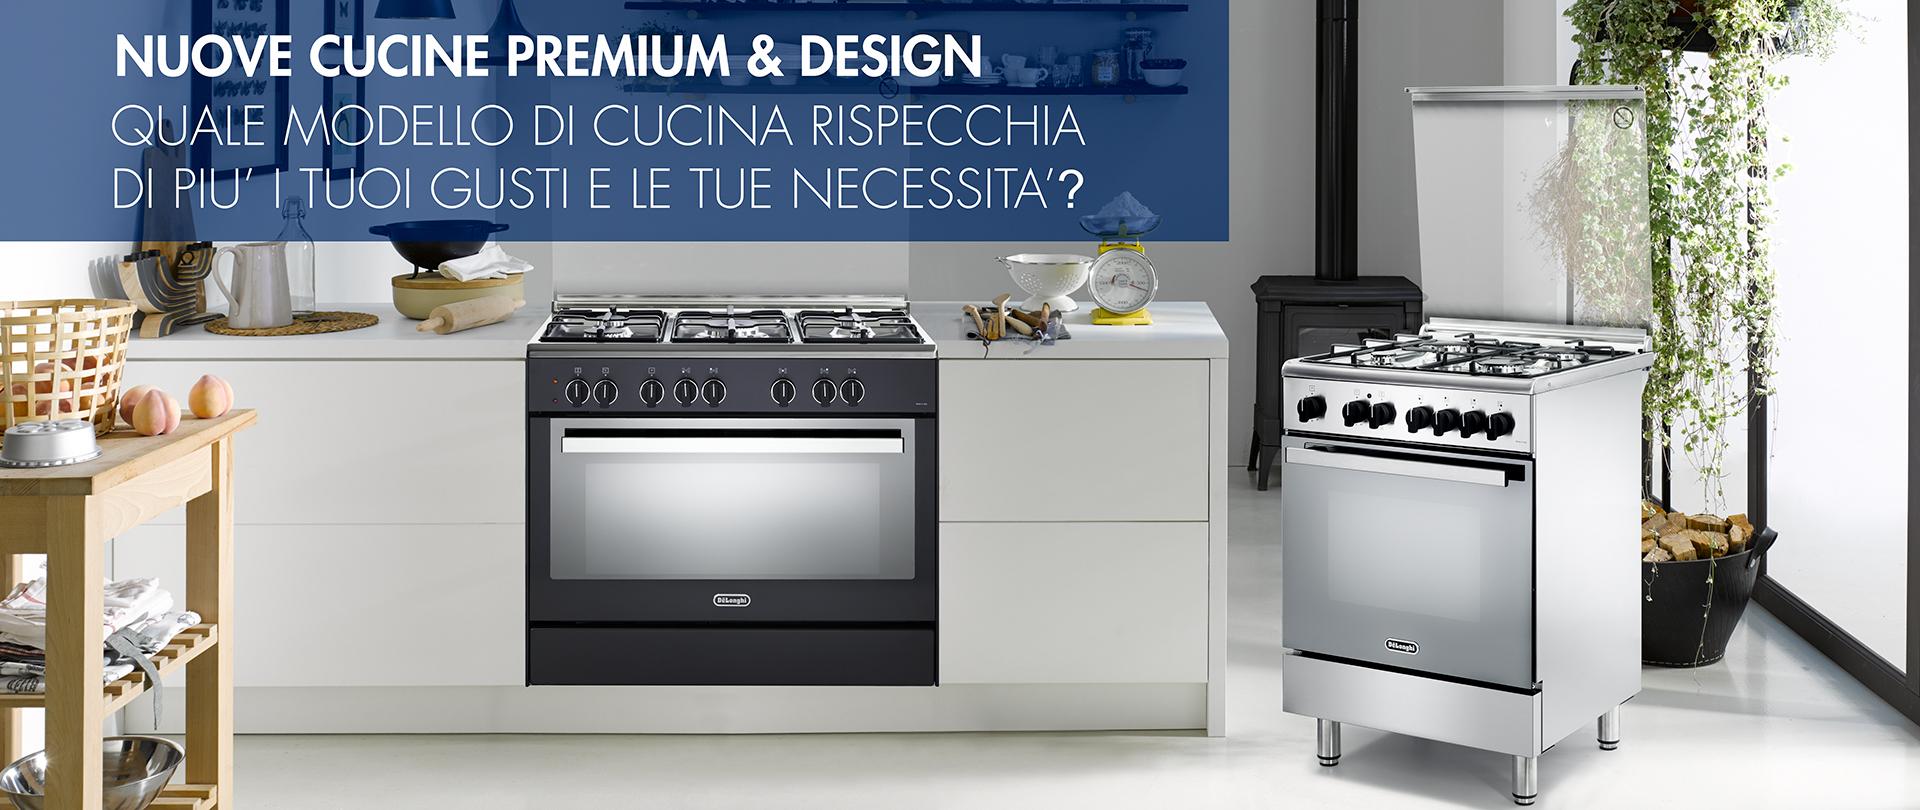 Nuove cucine Premium e Design